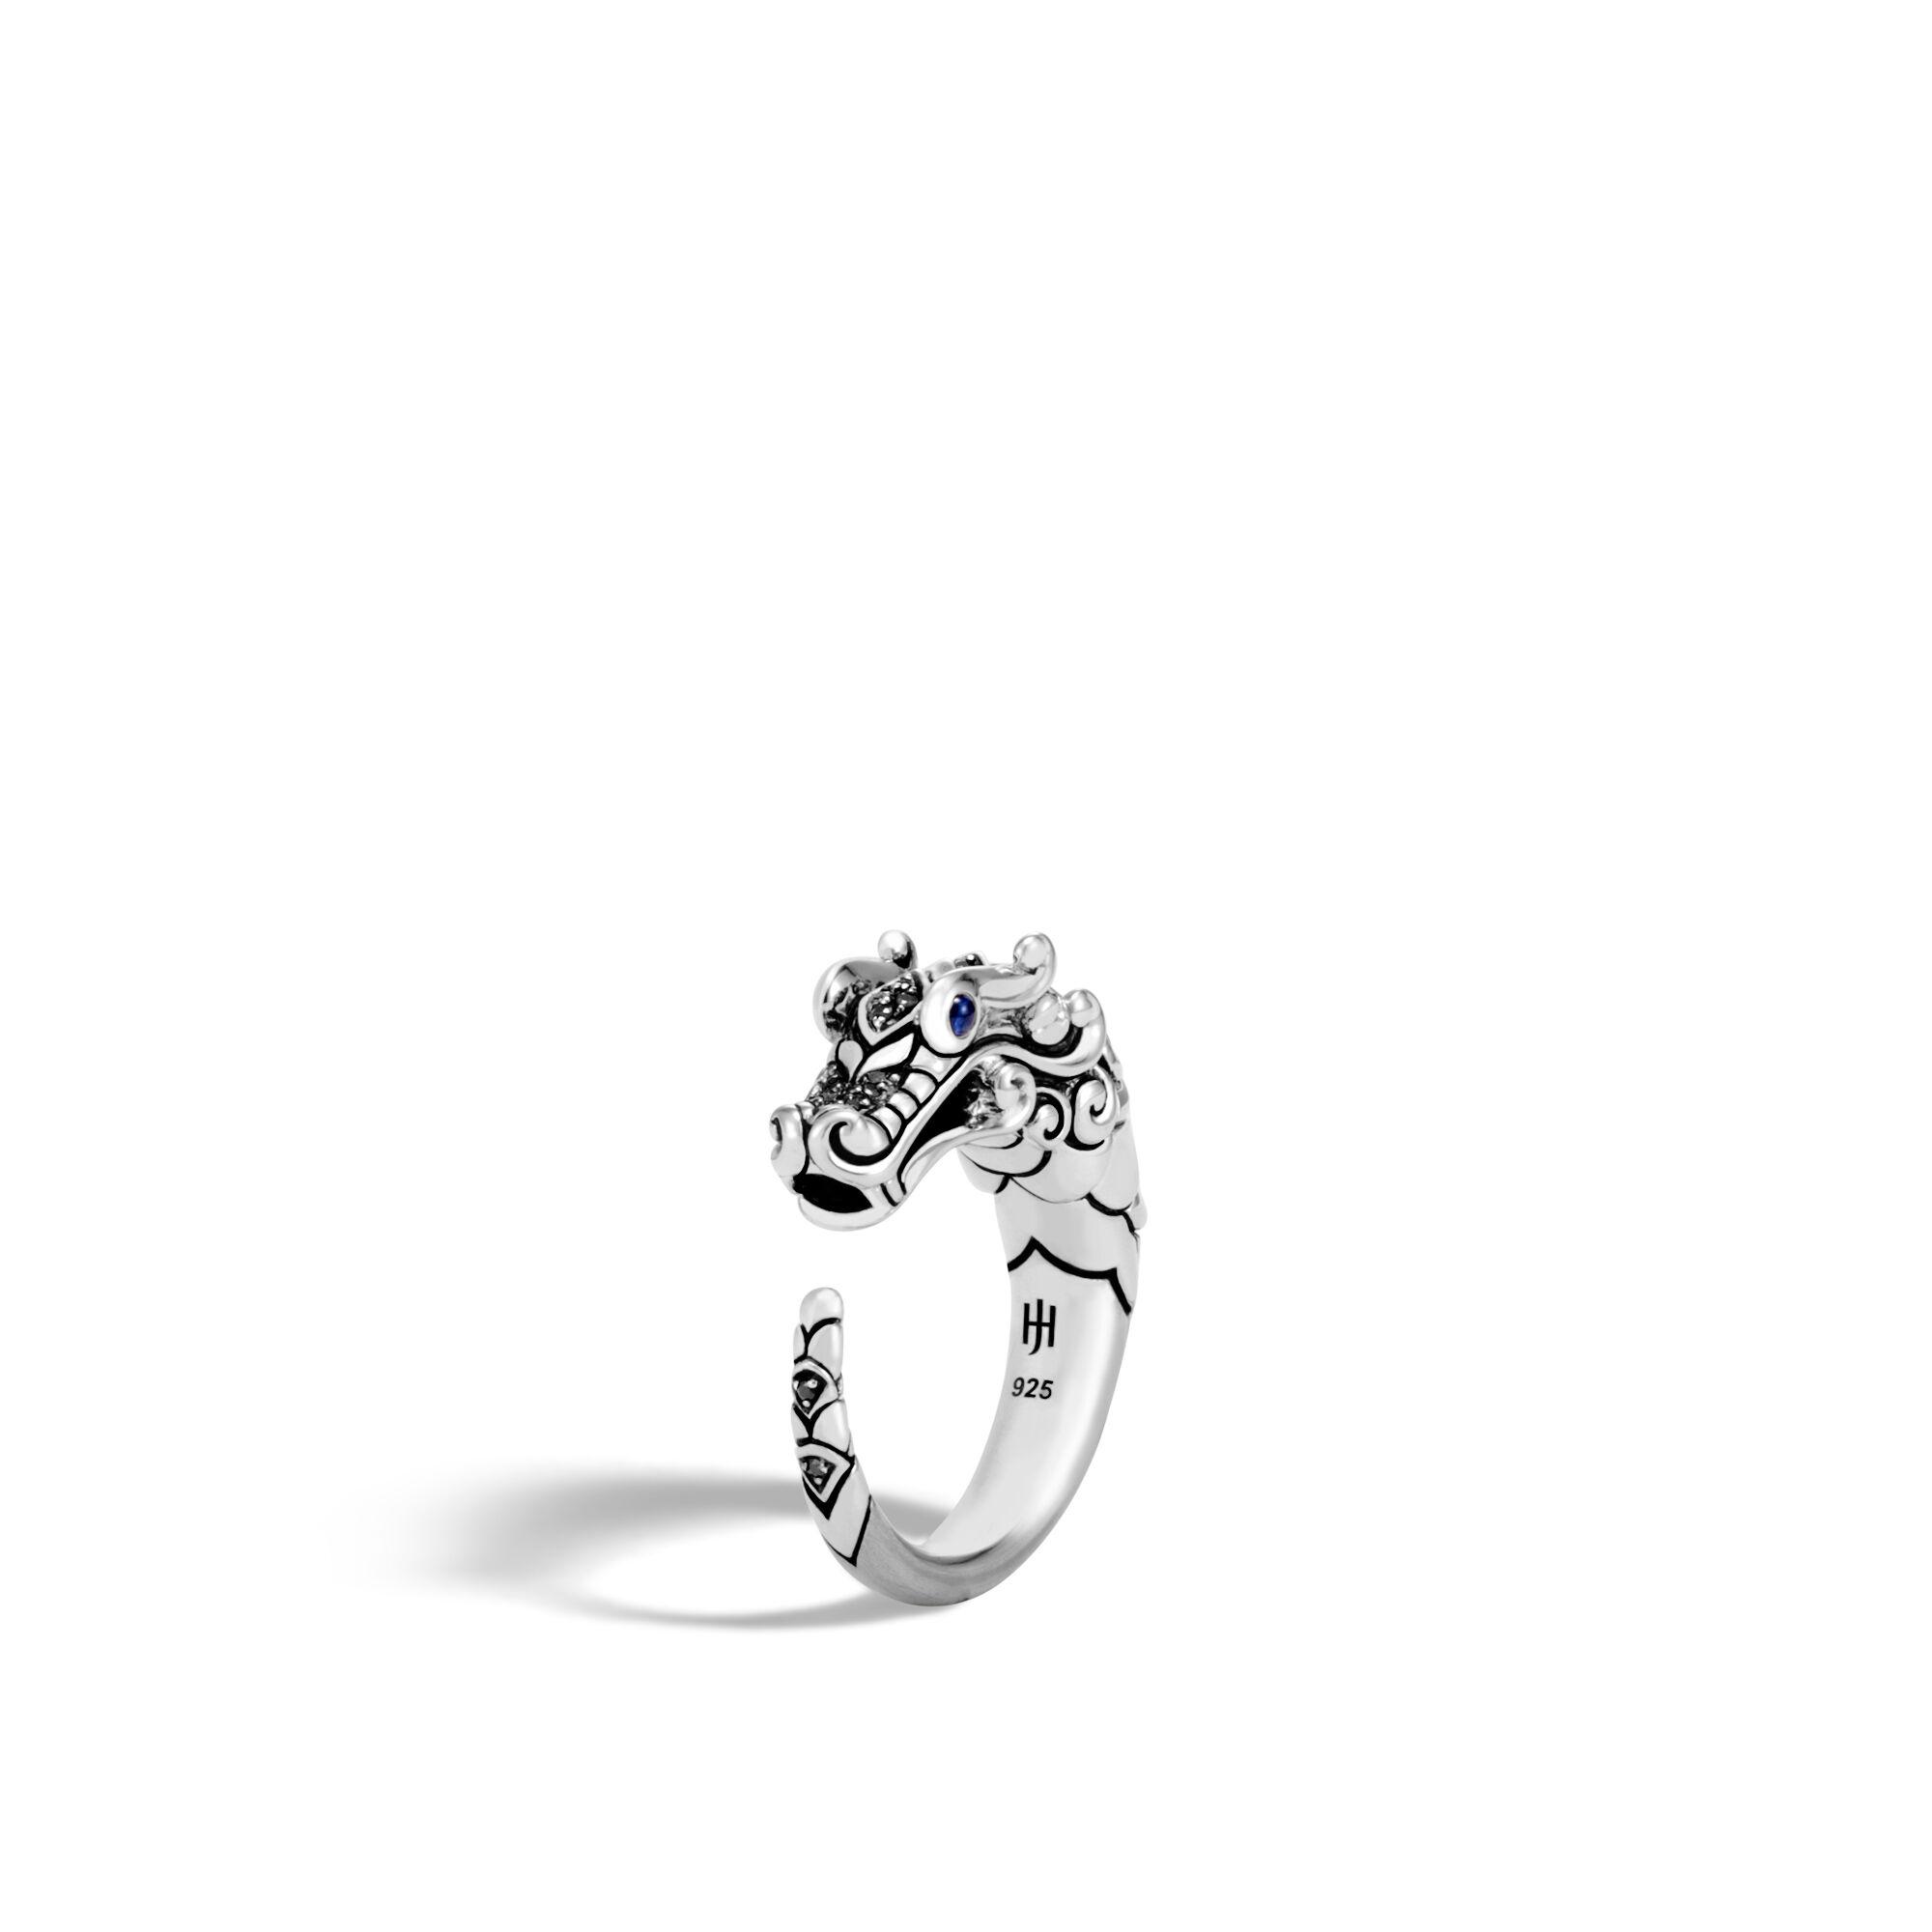 John Hardy Naga Ring With Black Sapphire, Black Spinel